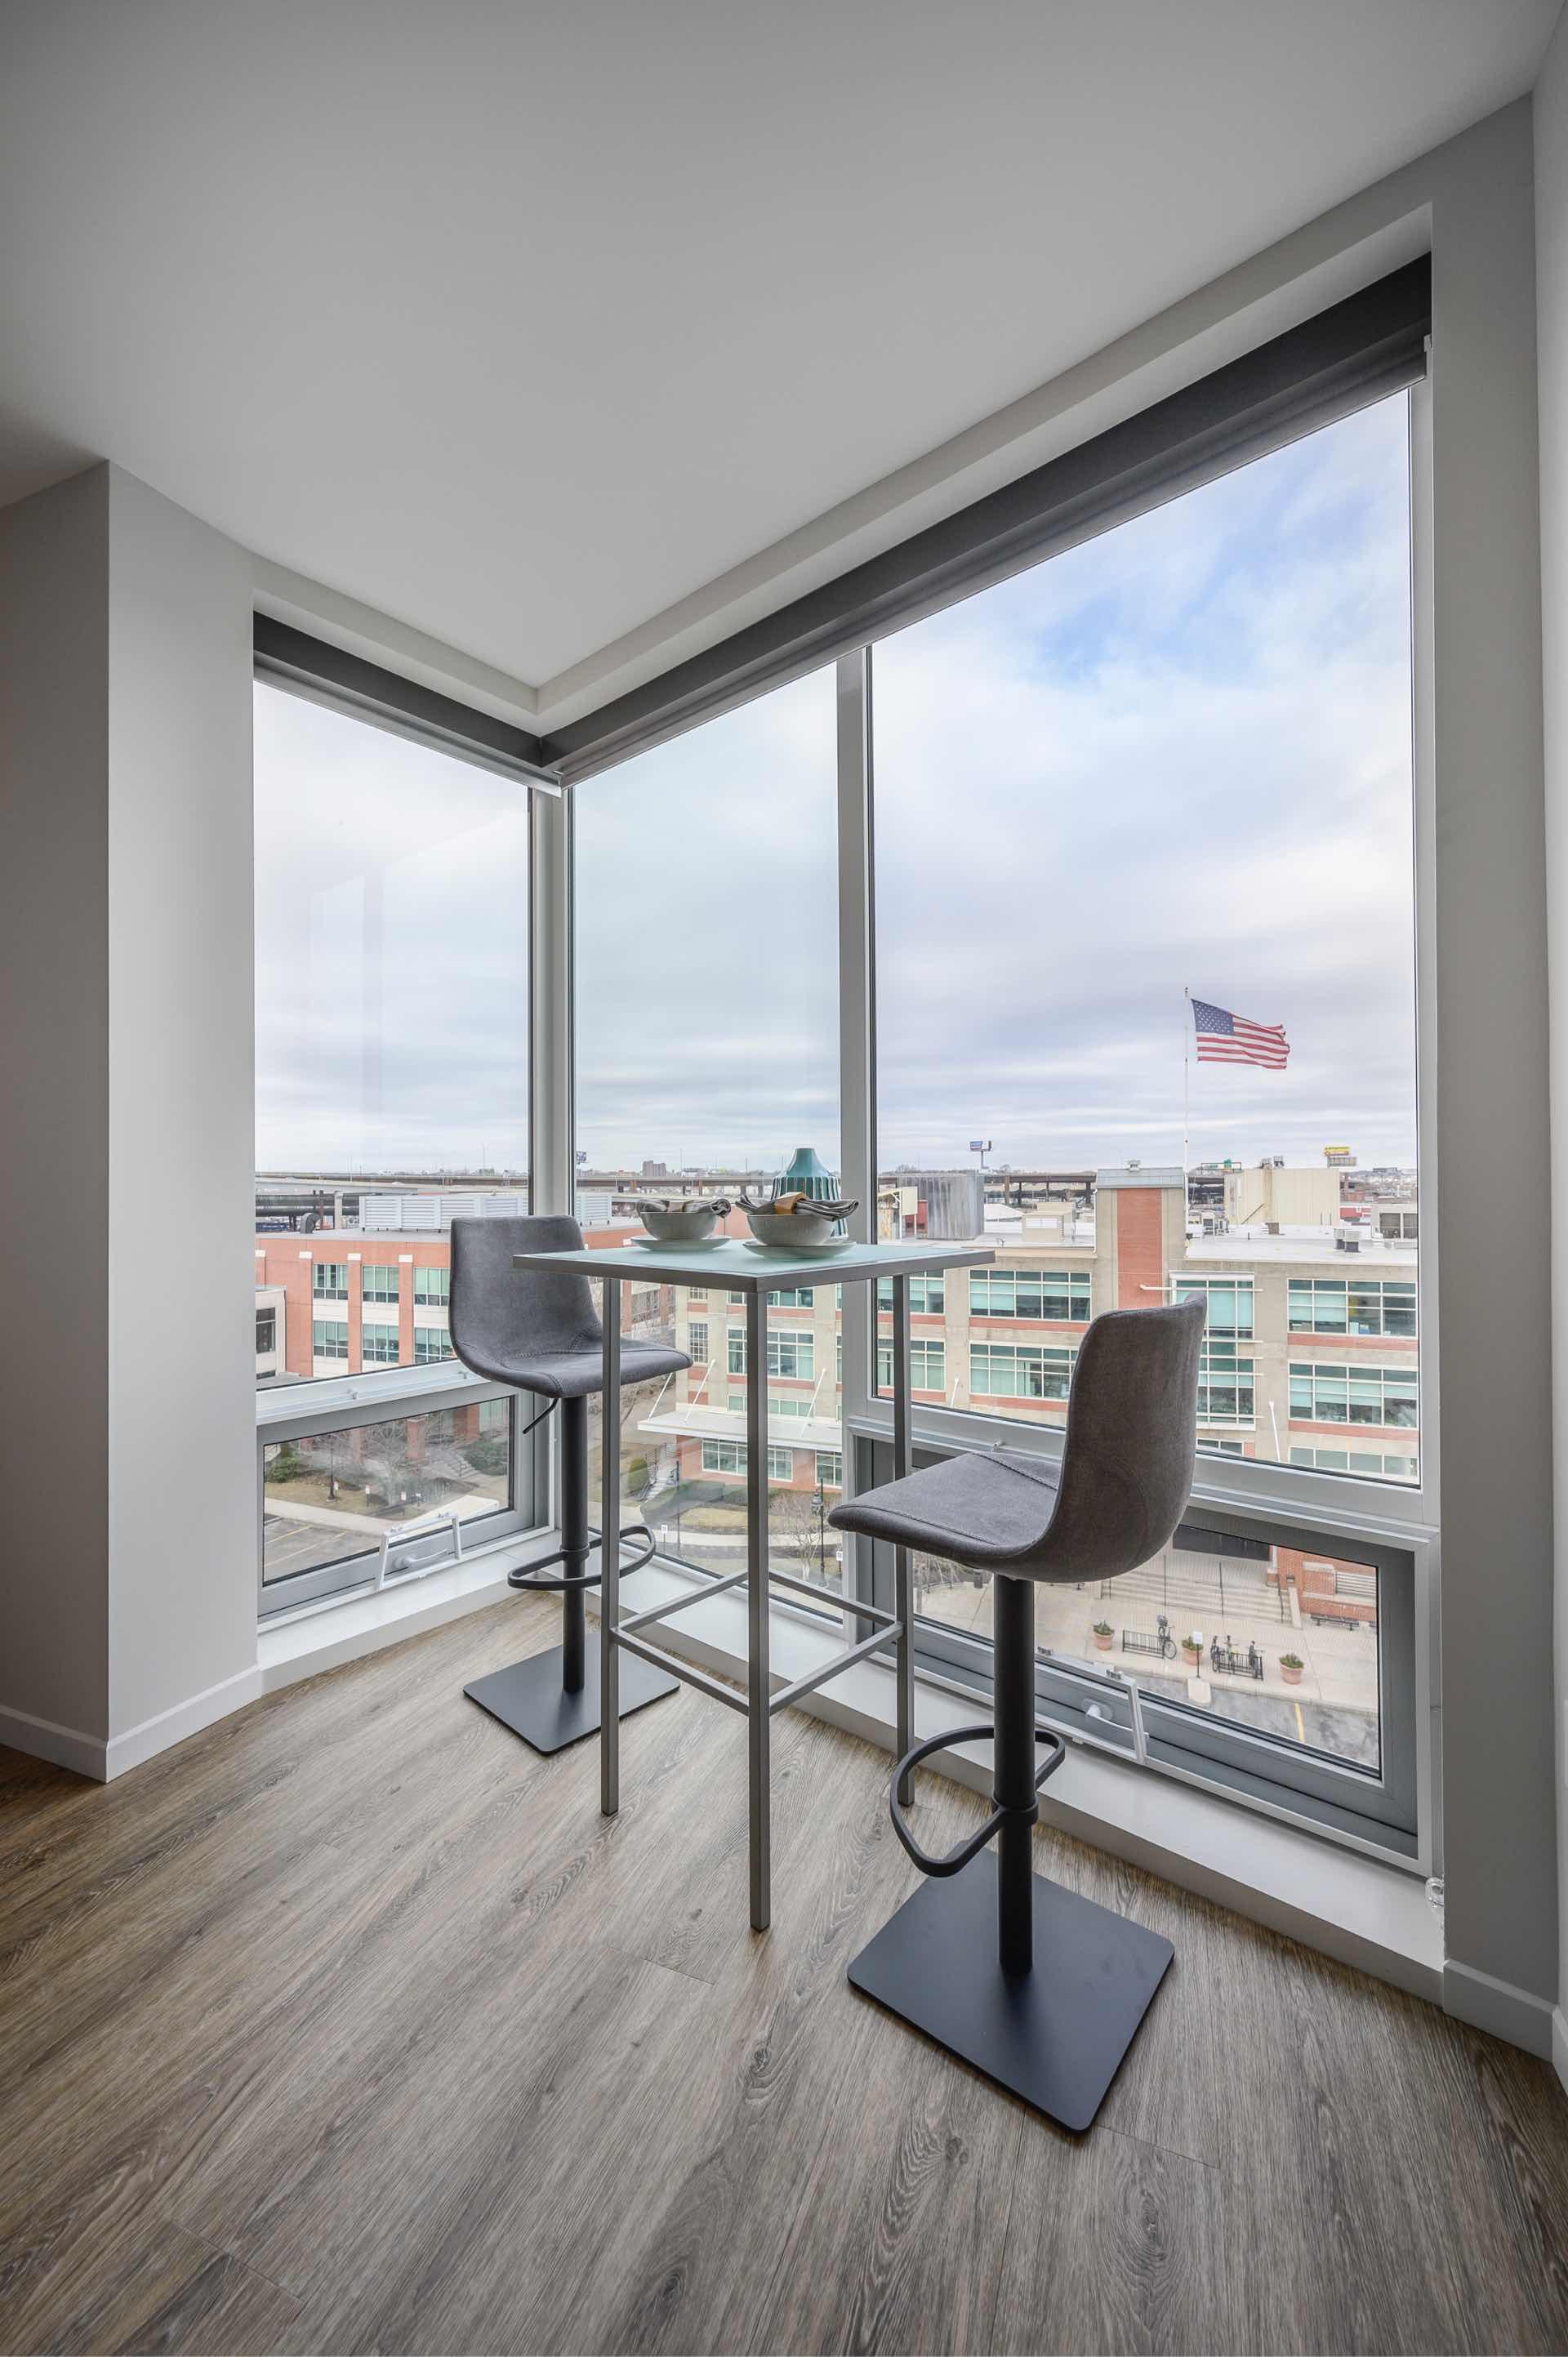 Apartments img 20